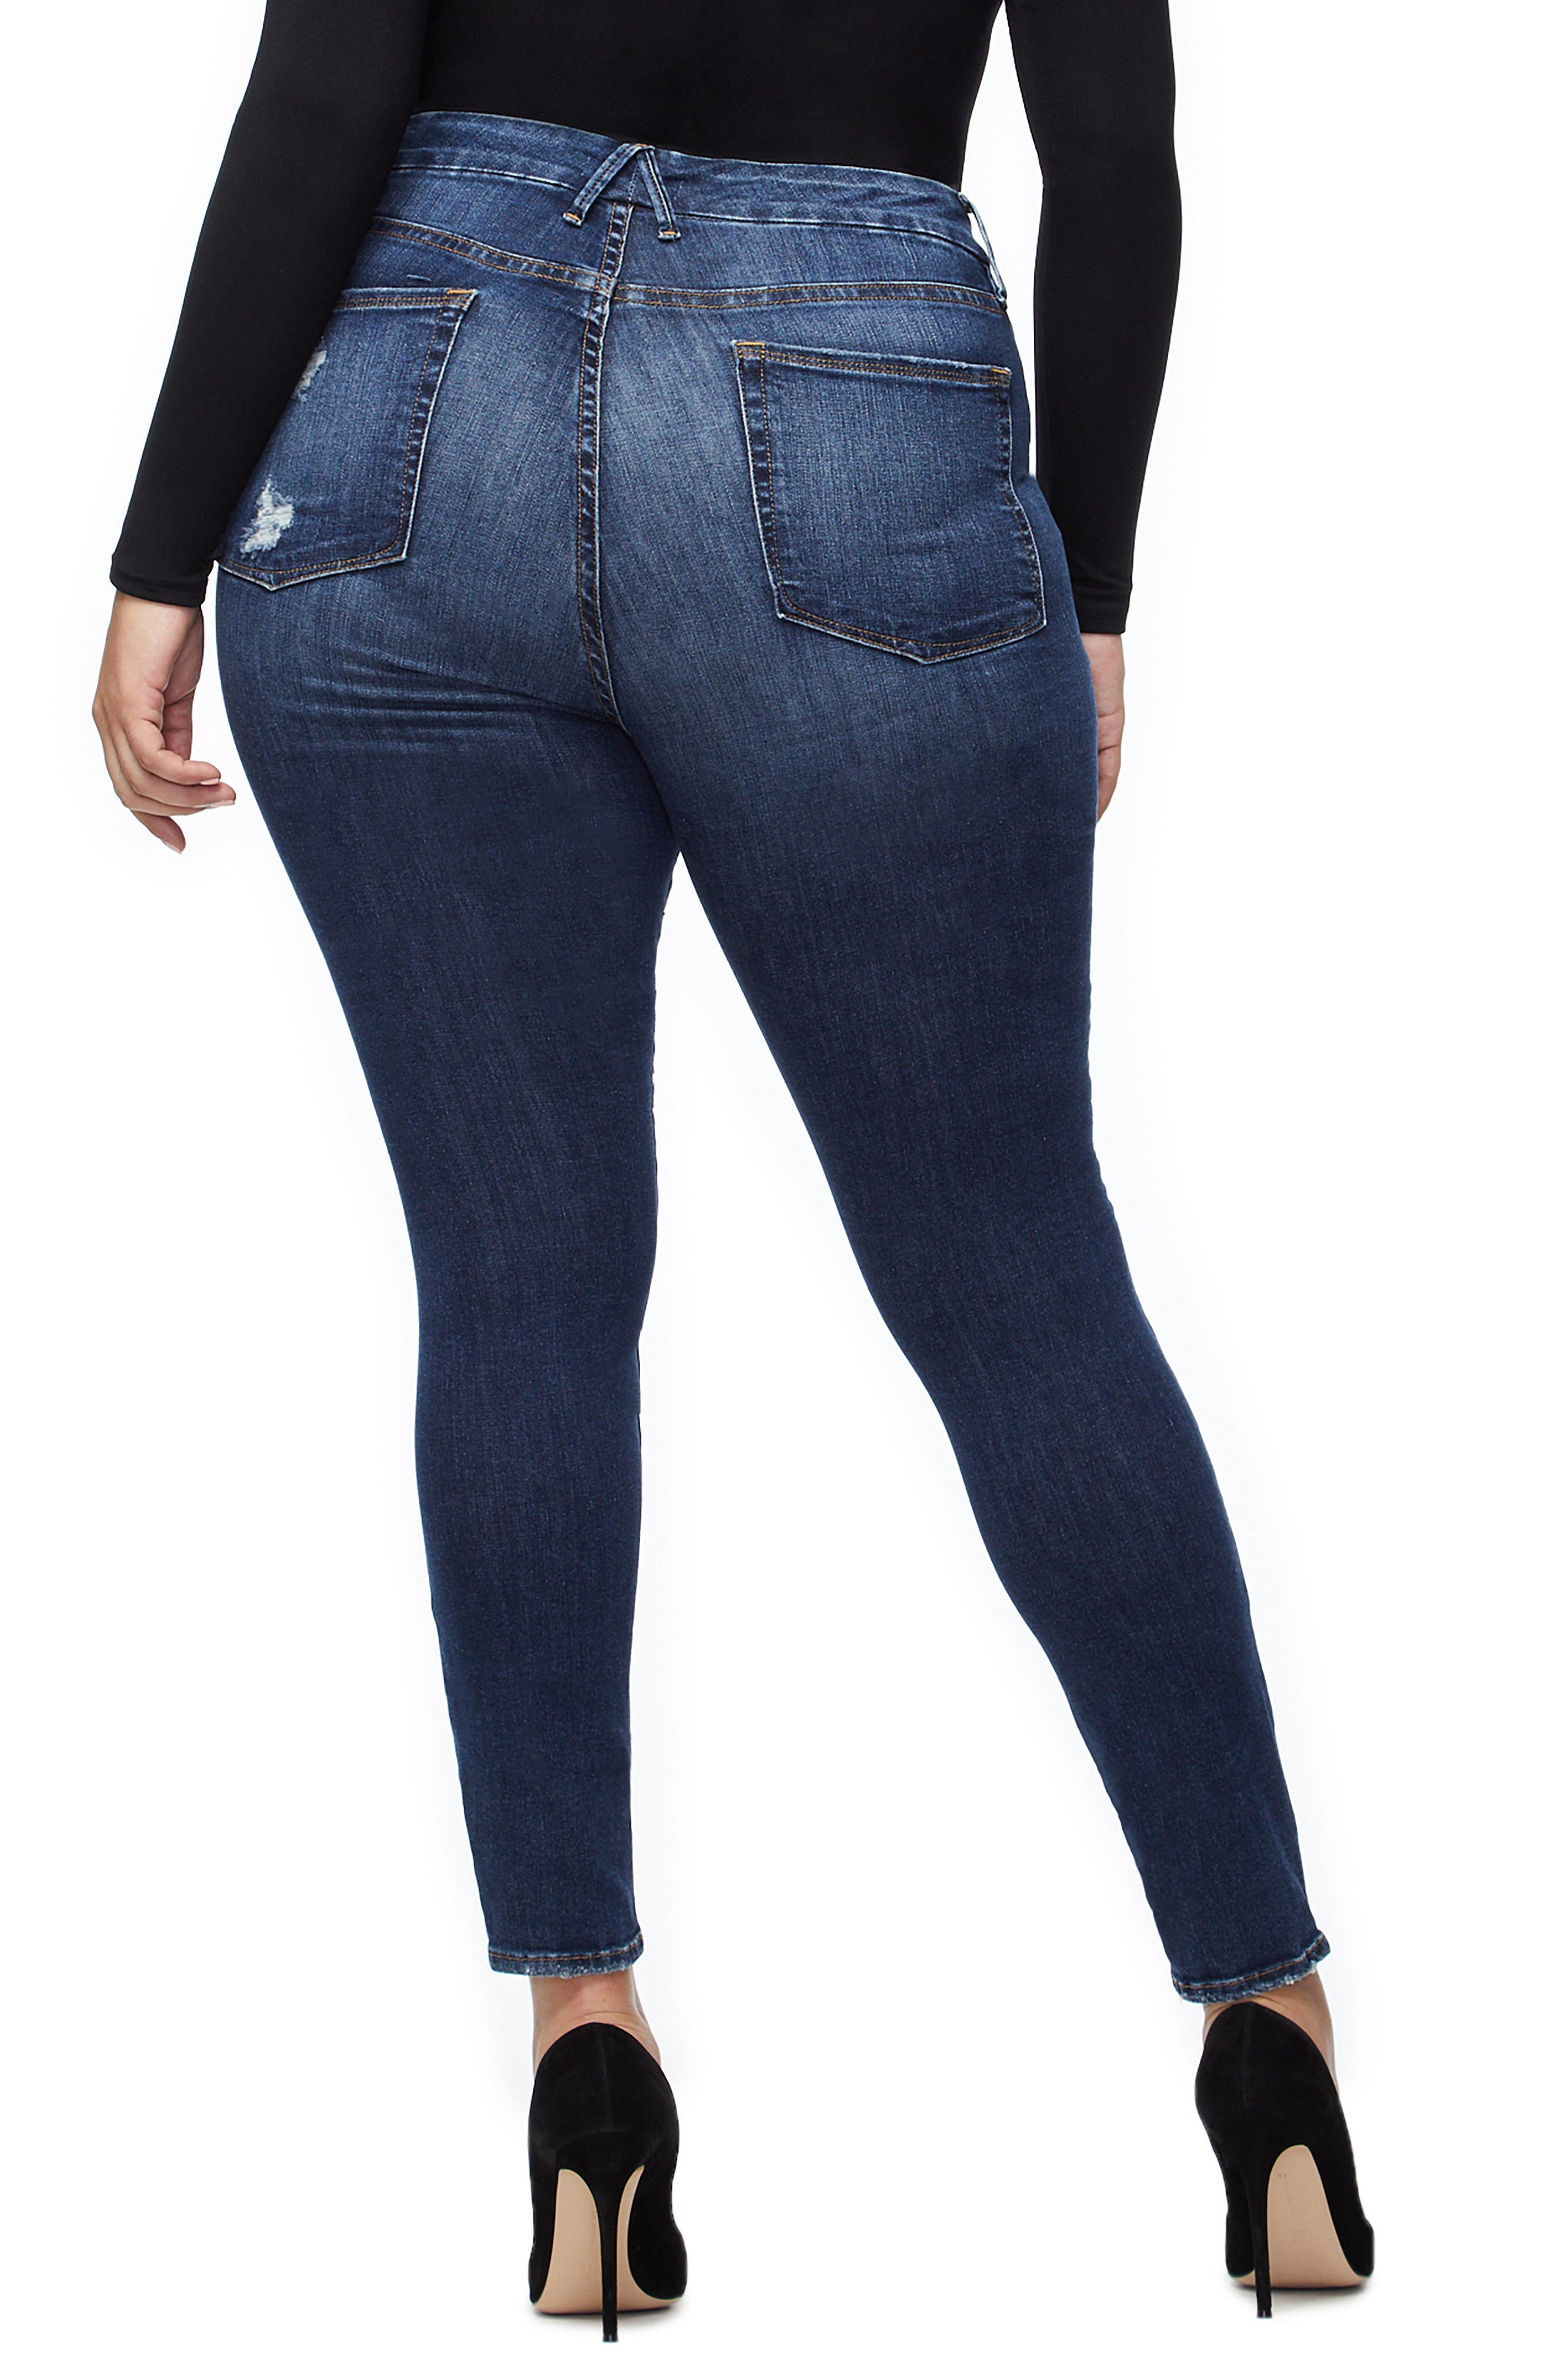 GOOD AMERICAN, Good Legs Cheetah Pockets High Waist Jeans, Alternate thumbnail 7, color, BLUE203